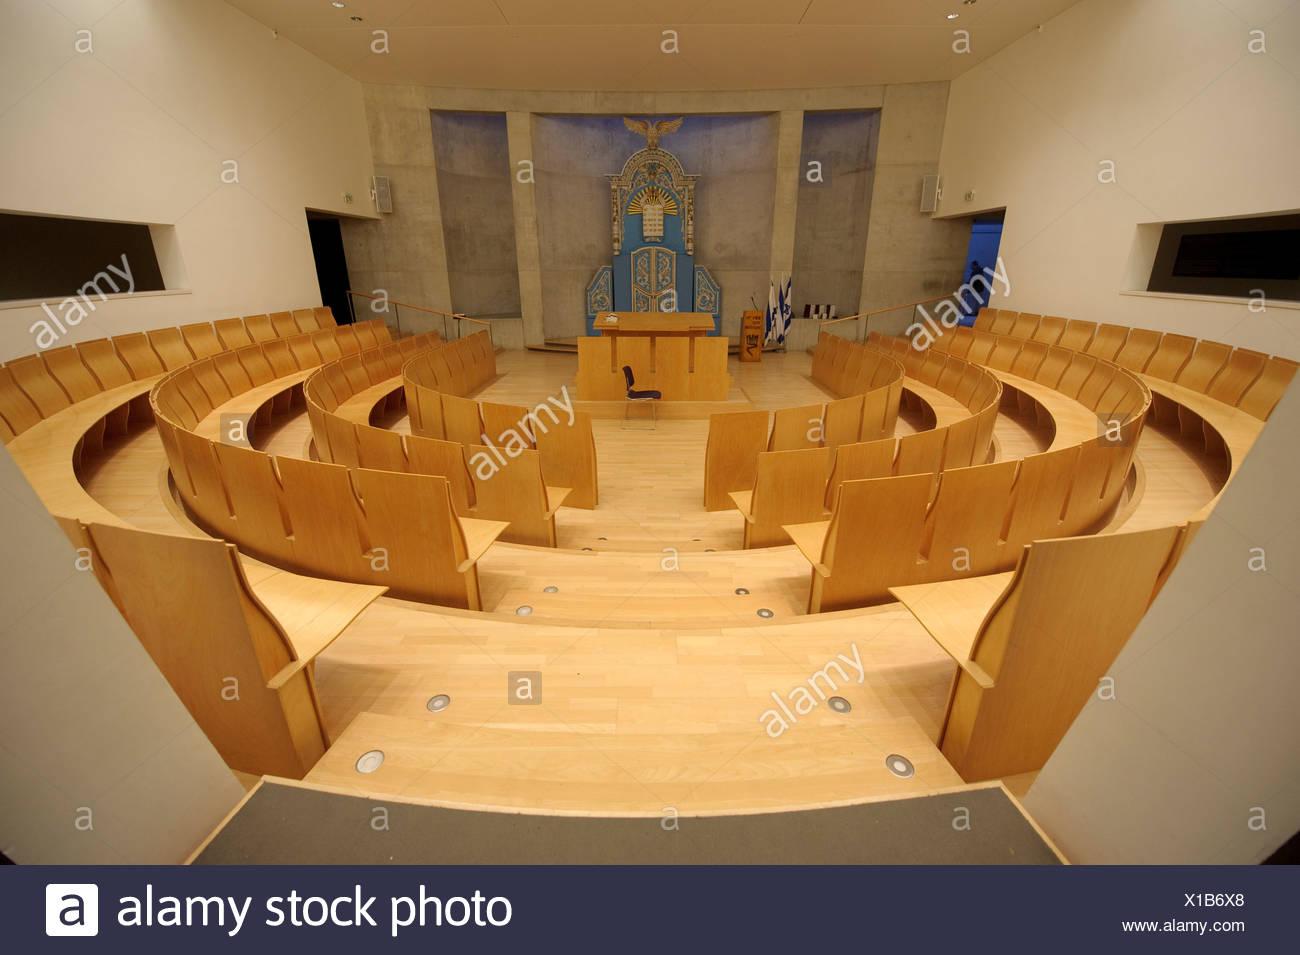 Memorial, Jew, Jewish, pogrom, persecution, Yad Vashem, Holocaust, Israel, Jerusalem, Middle East, Near East, synagogue - Stock Image